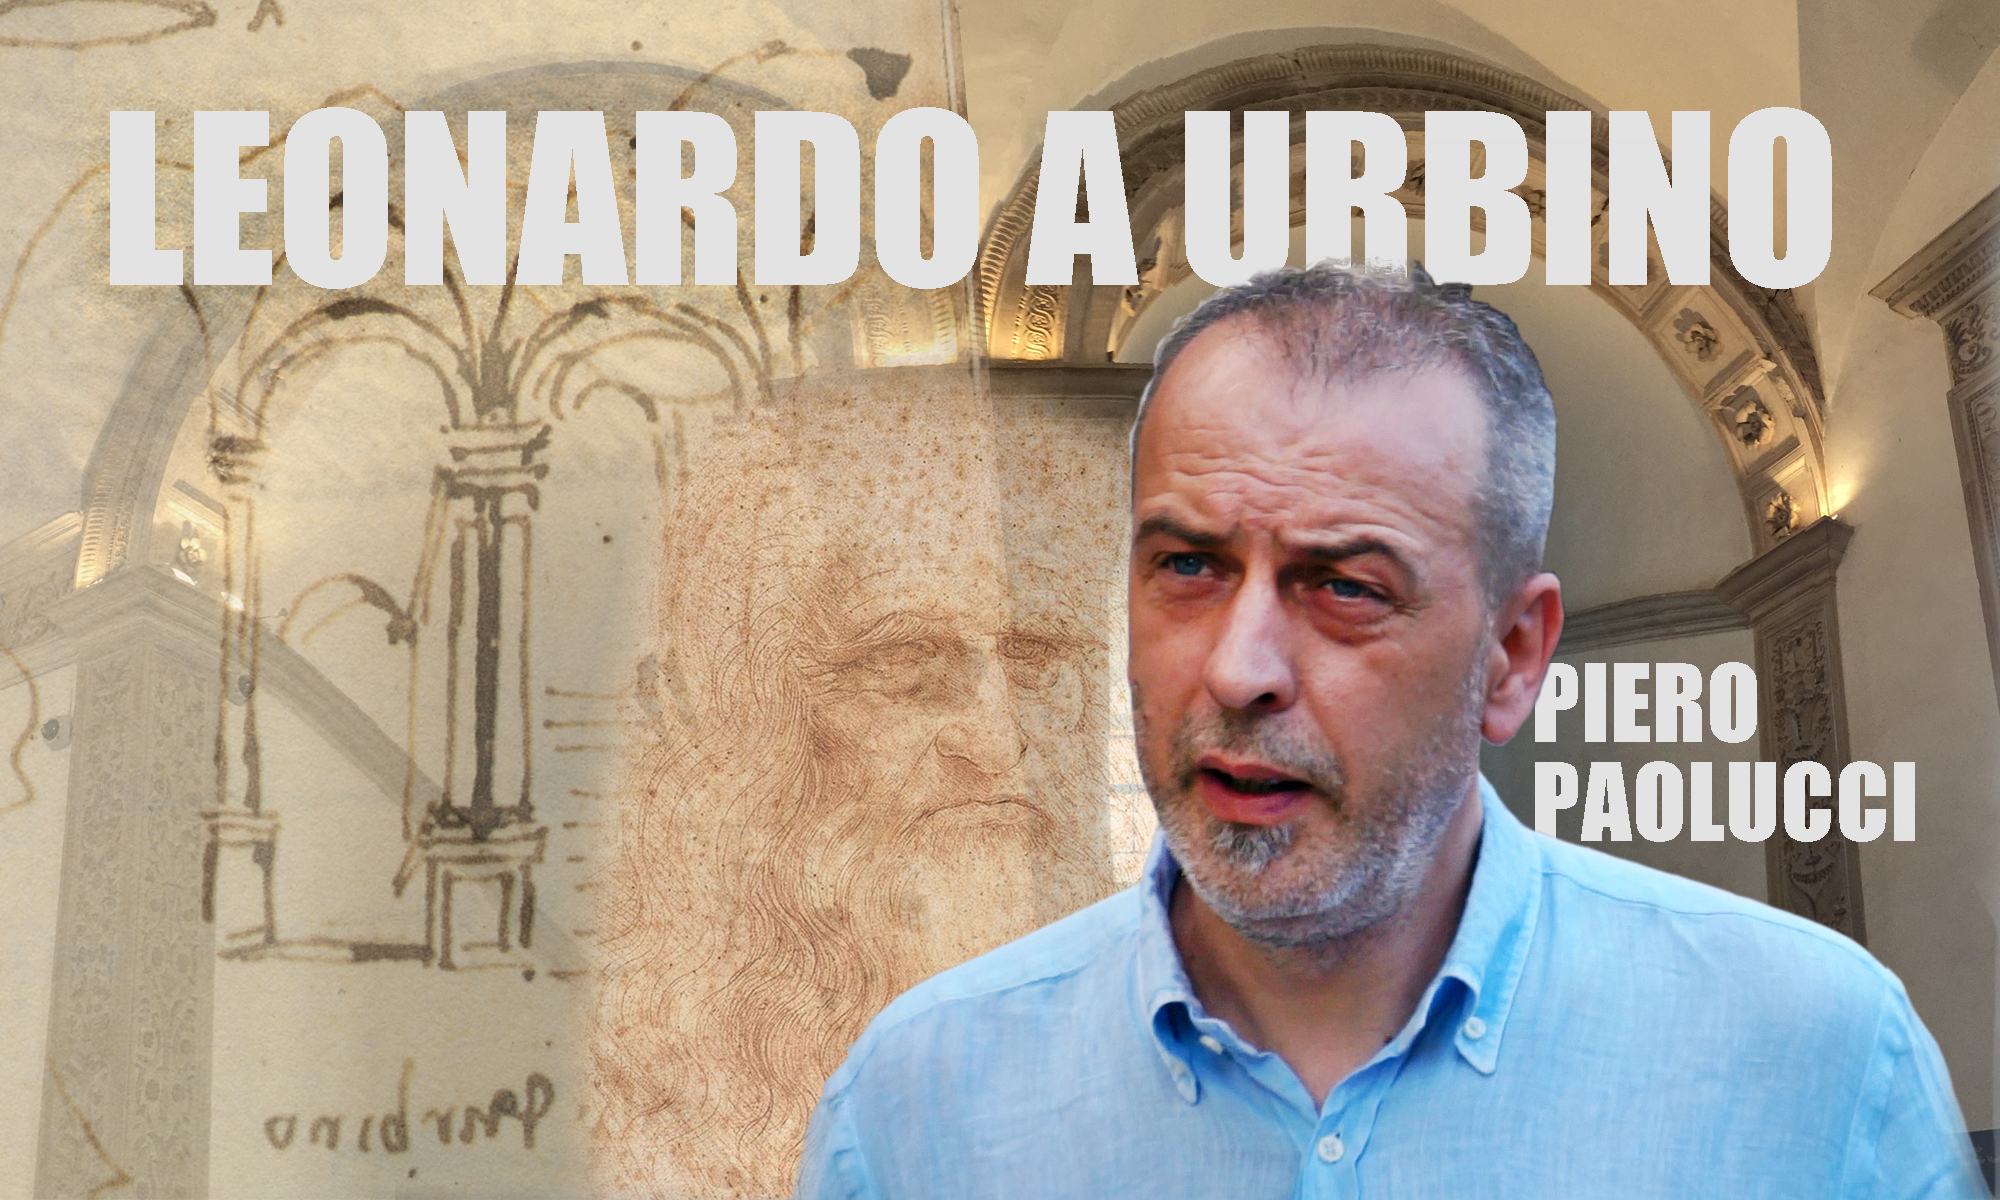 Leonardo da Vinci a Urbino